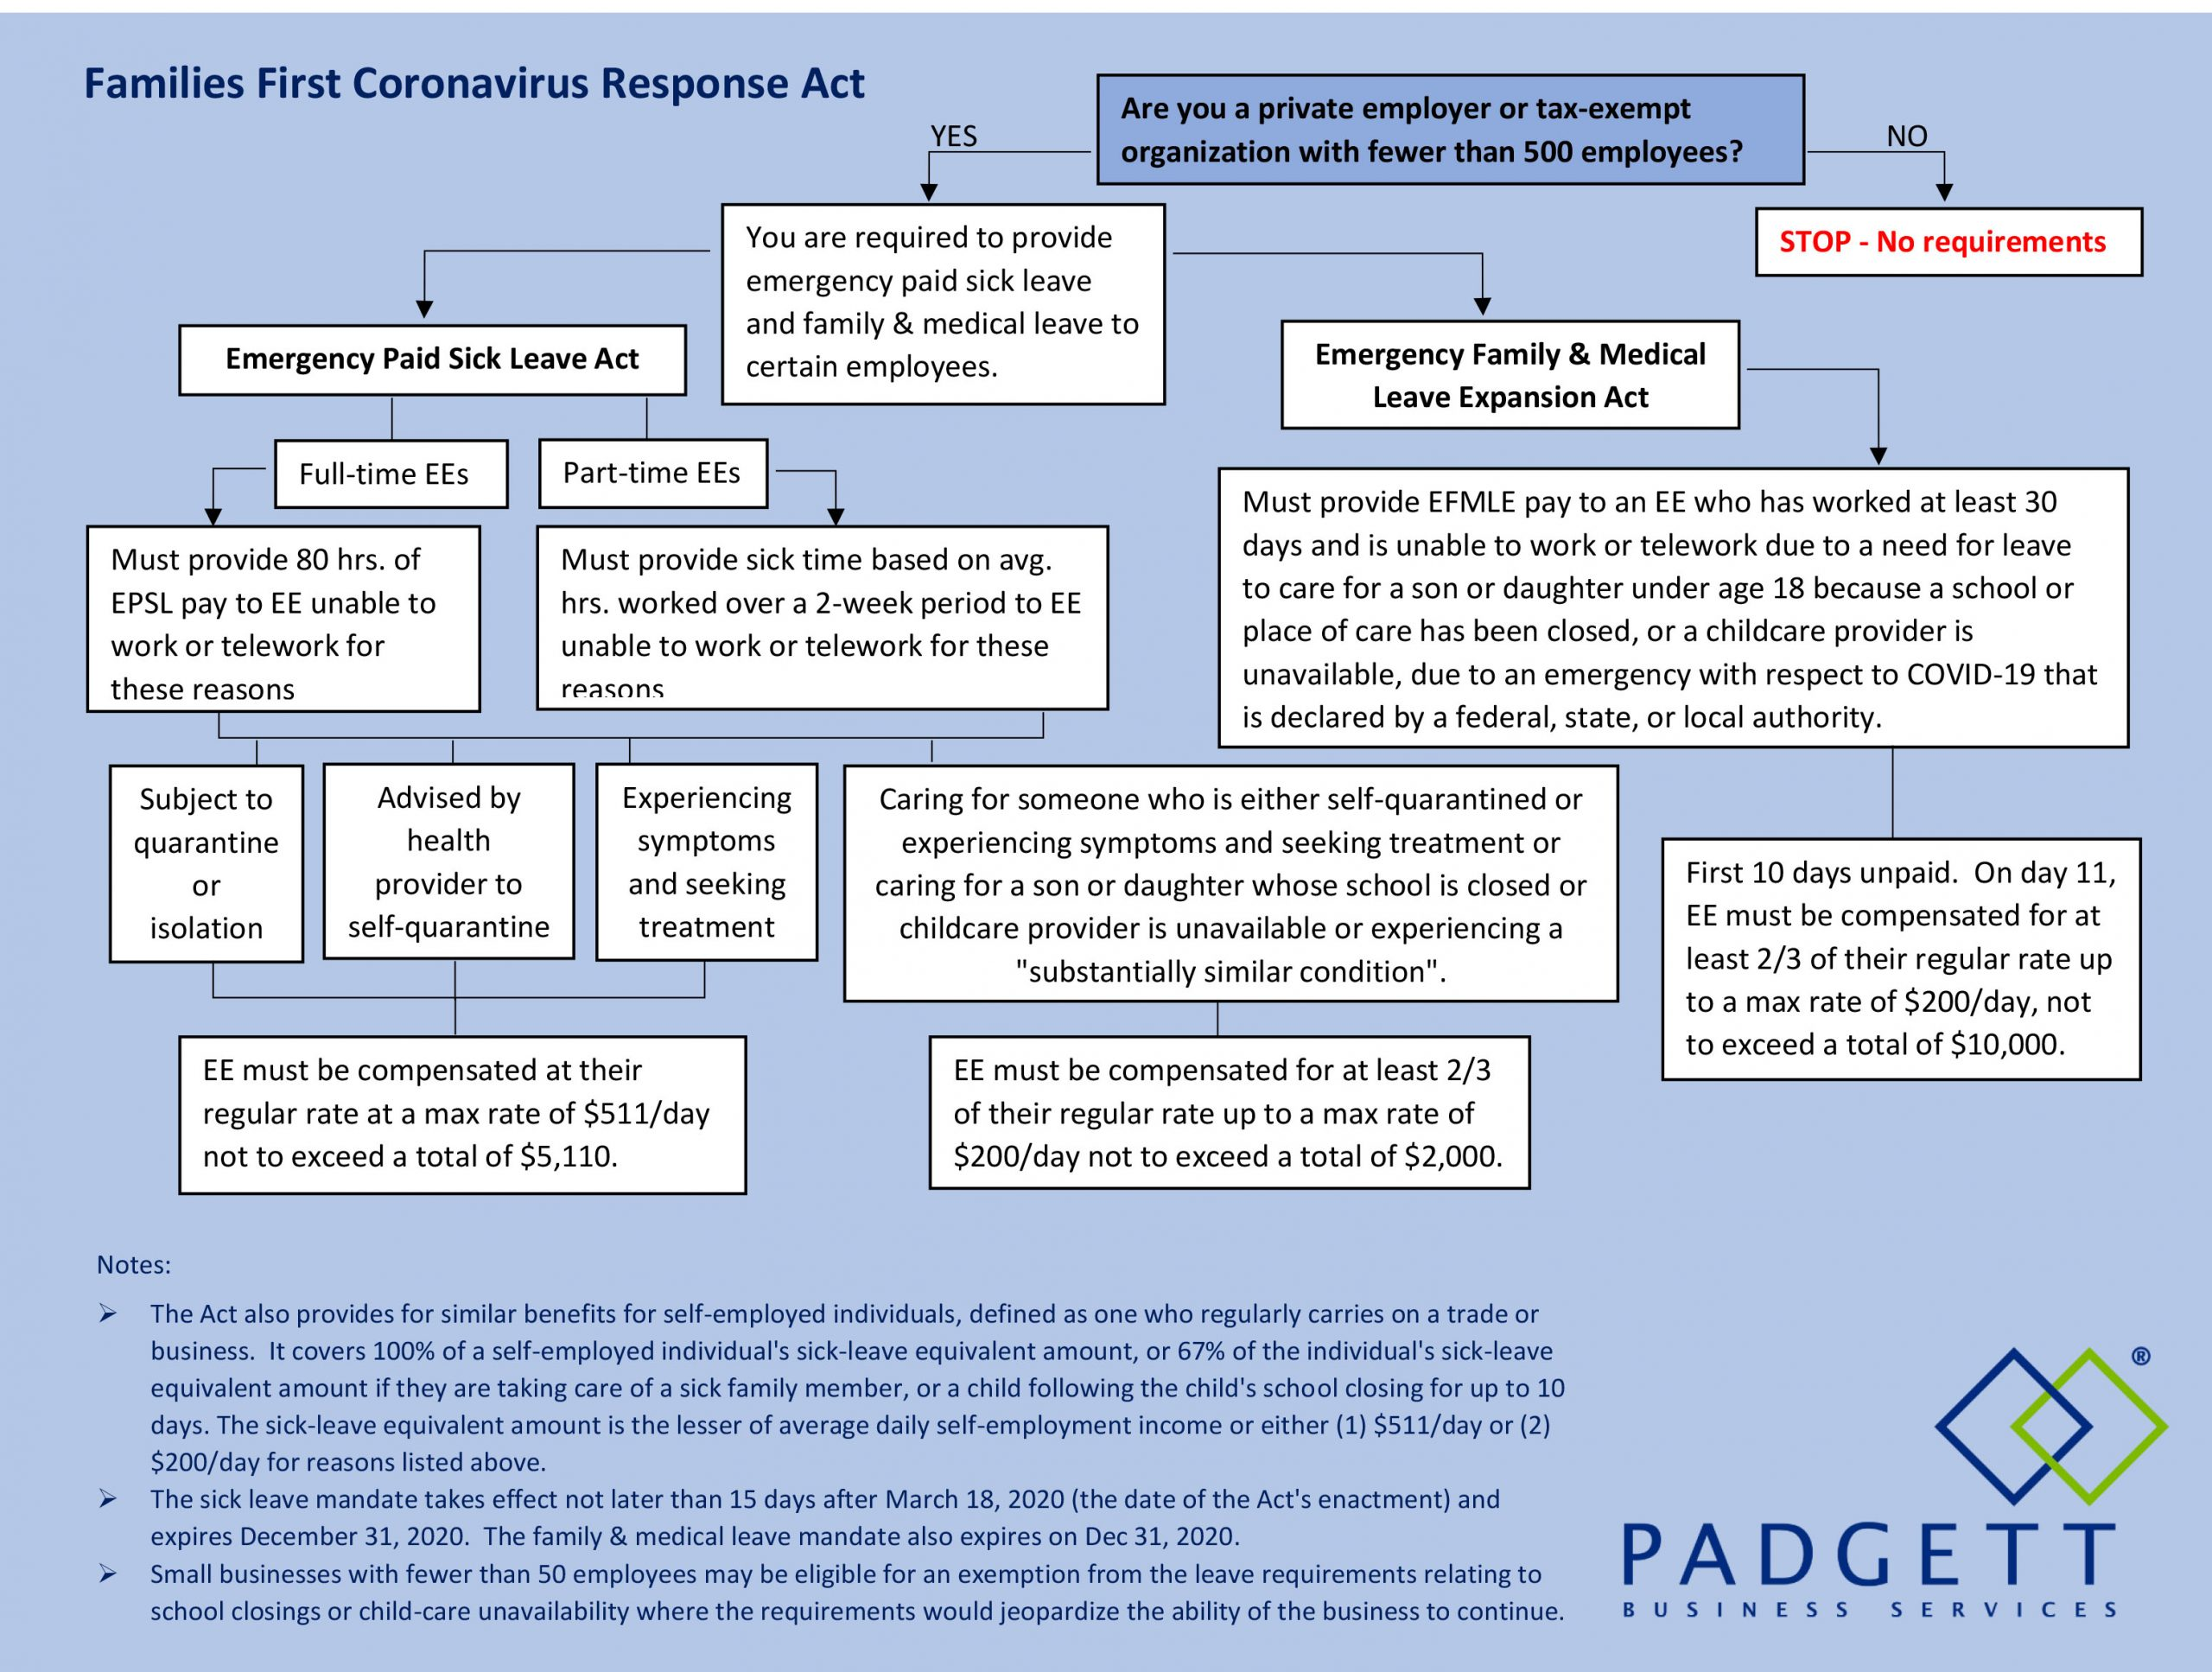 Families First Coronavirus Response Act Flowchart - Padgett-1